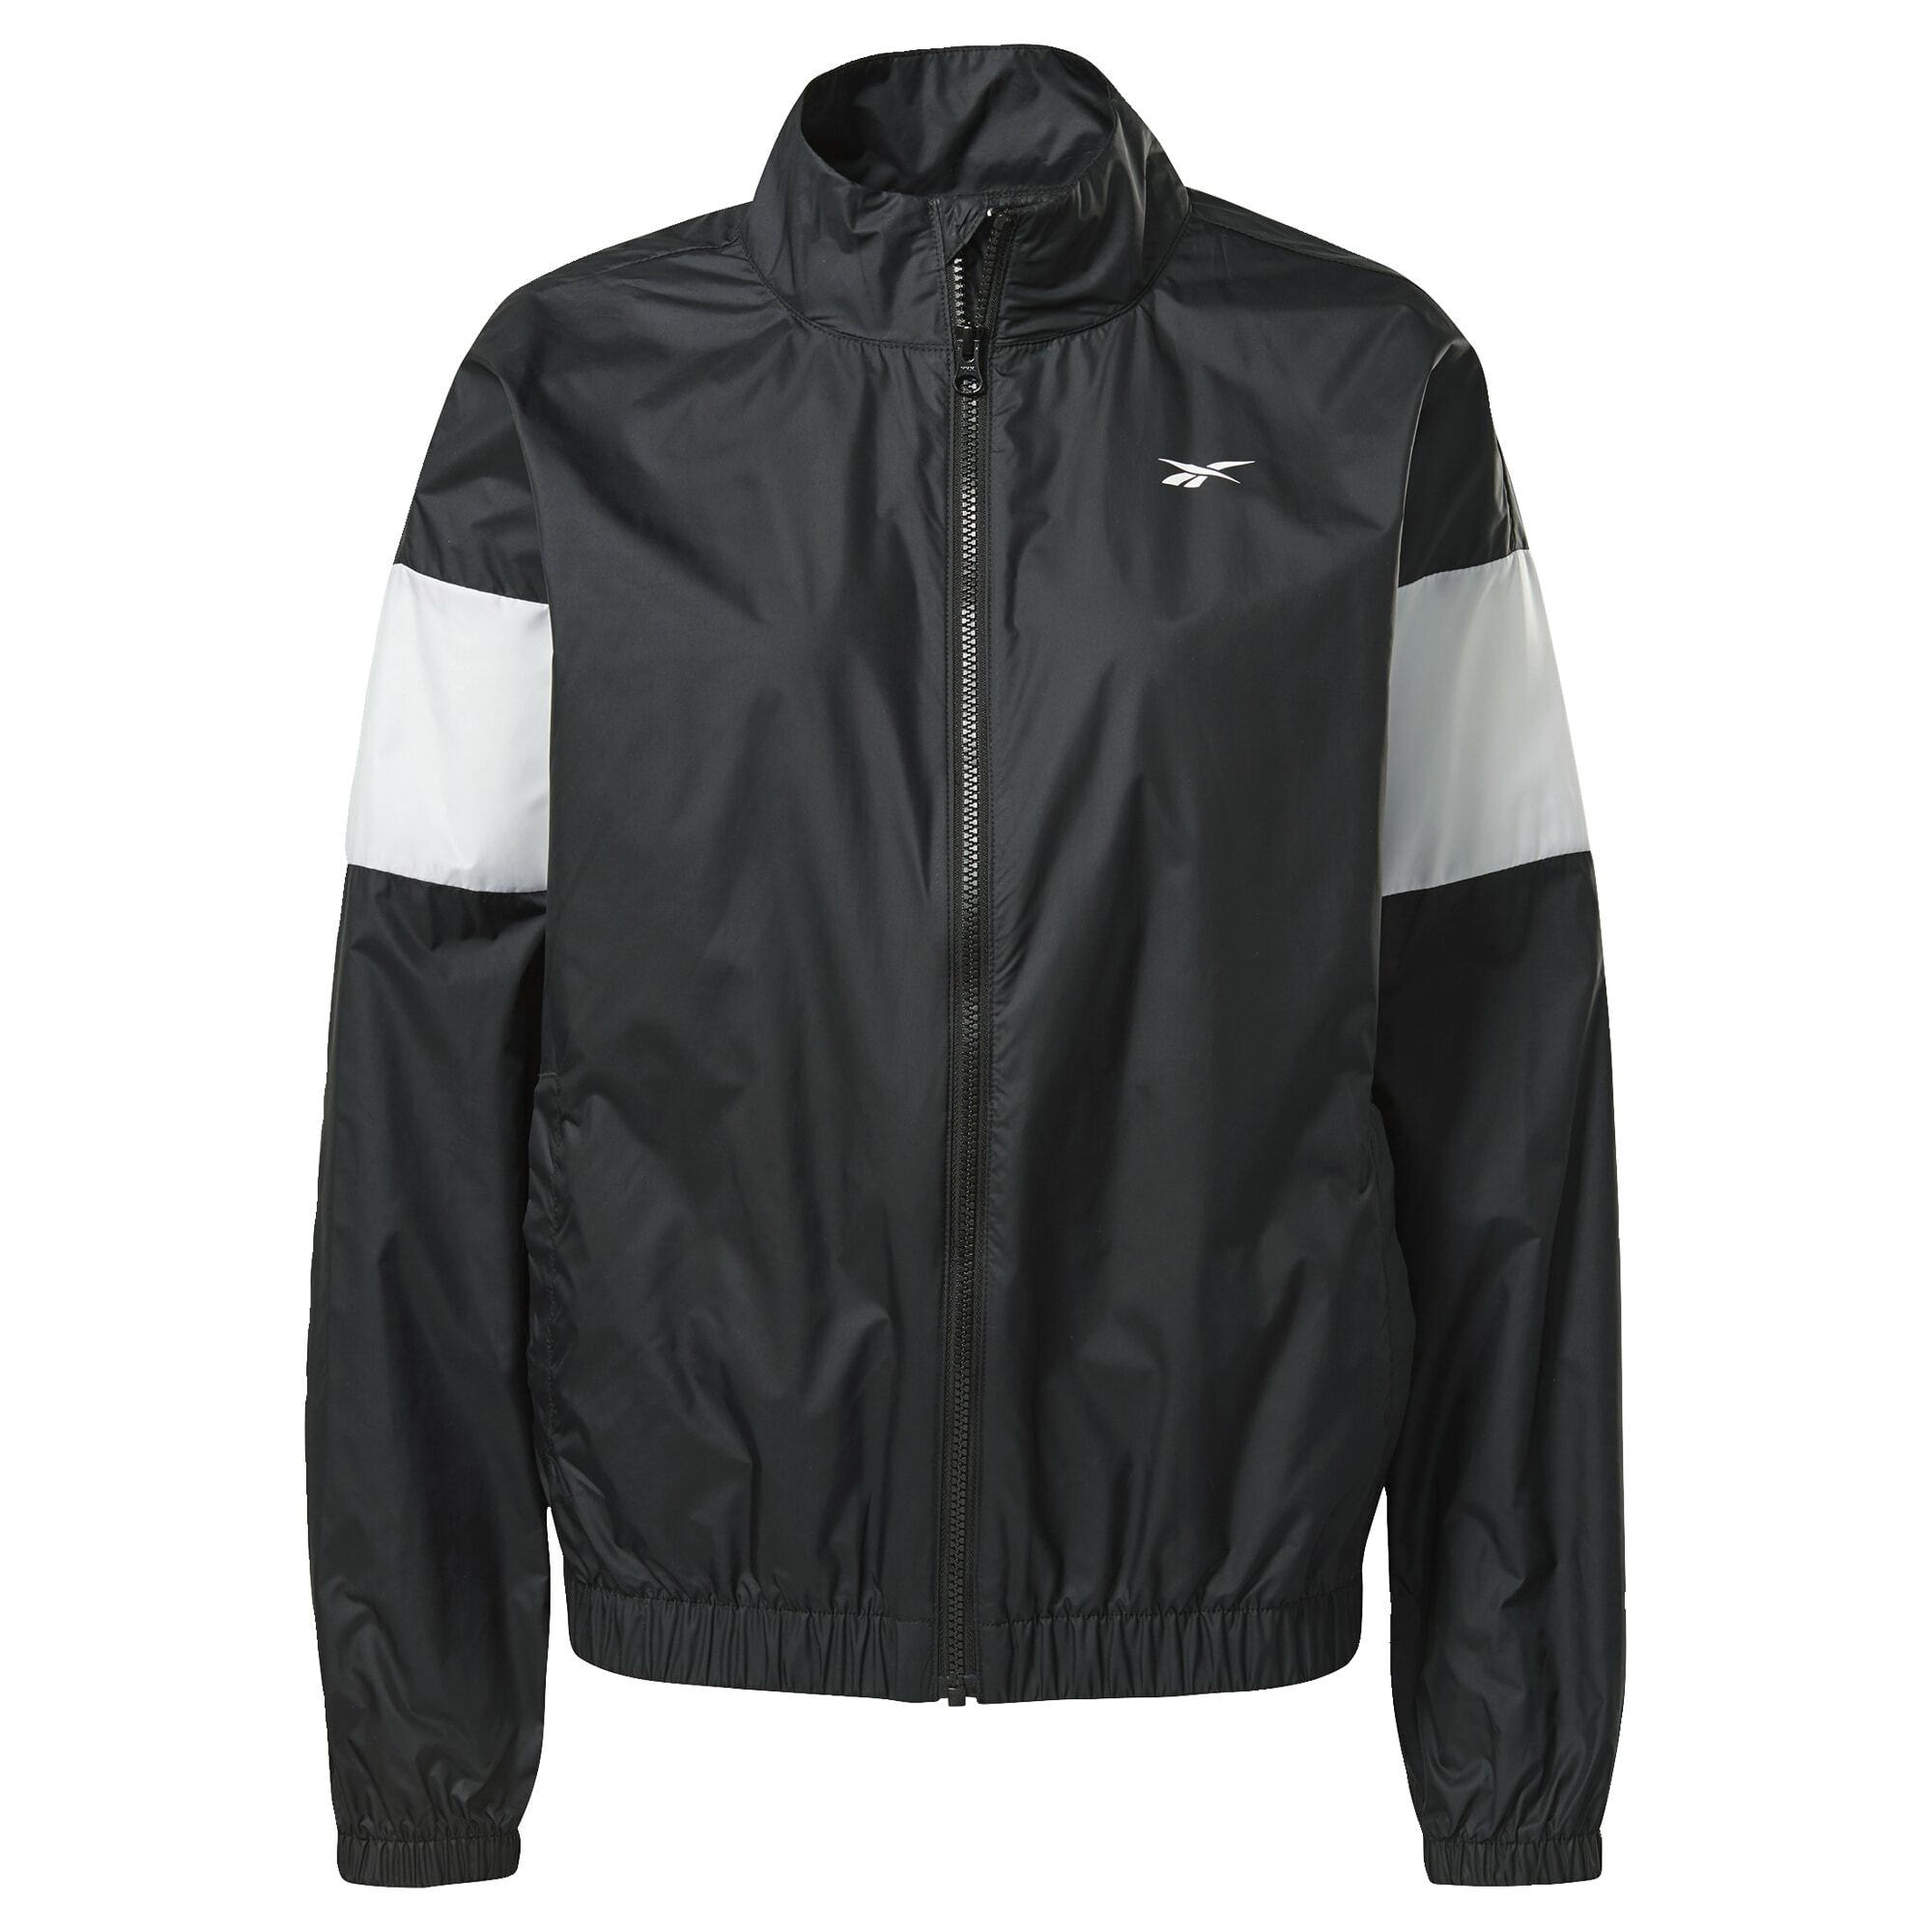 REEBOK Džemperis treniruotėms juoda / balta